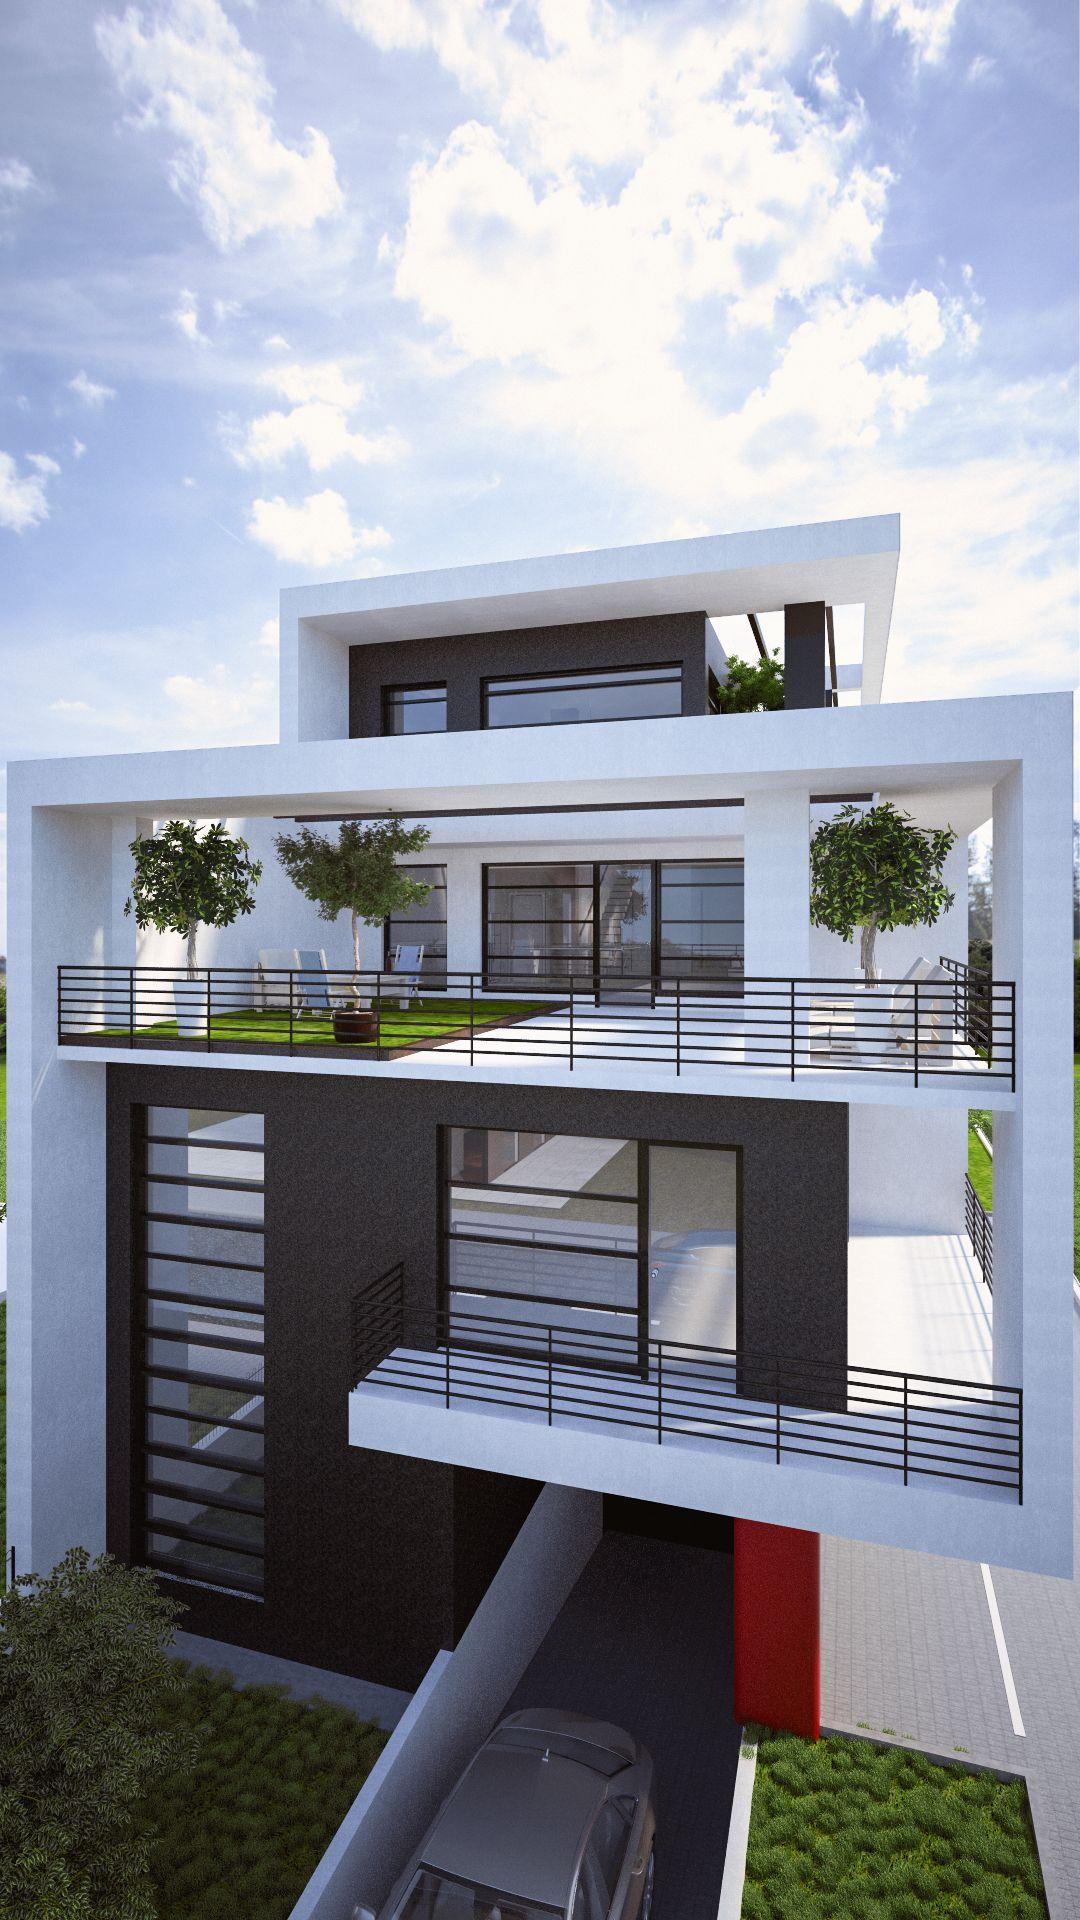 Double mixed use development www noveltyae ro maison de ville